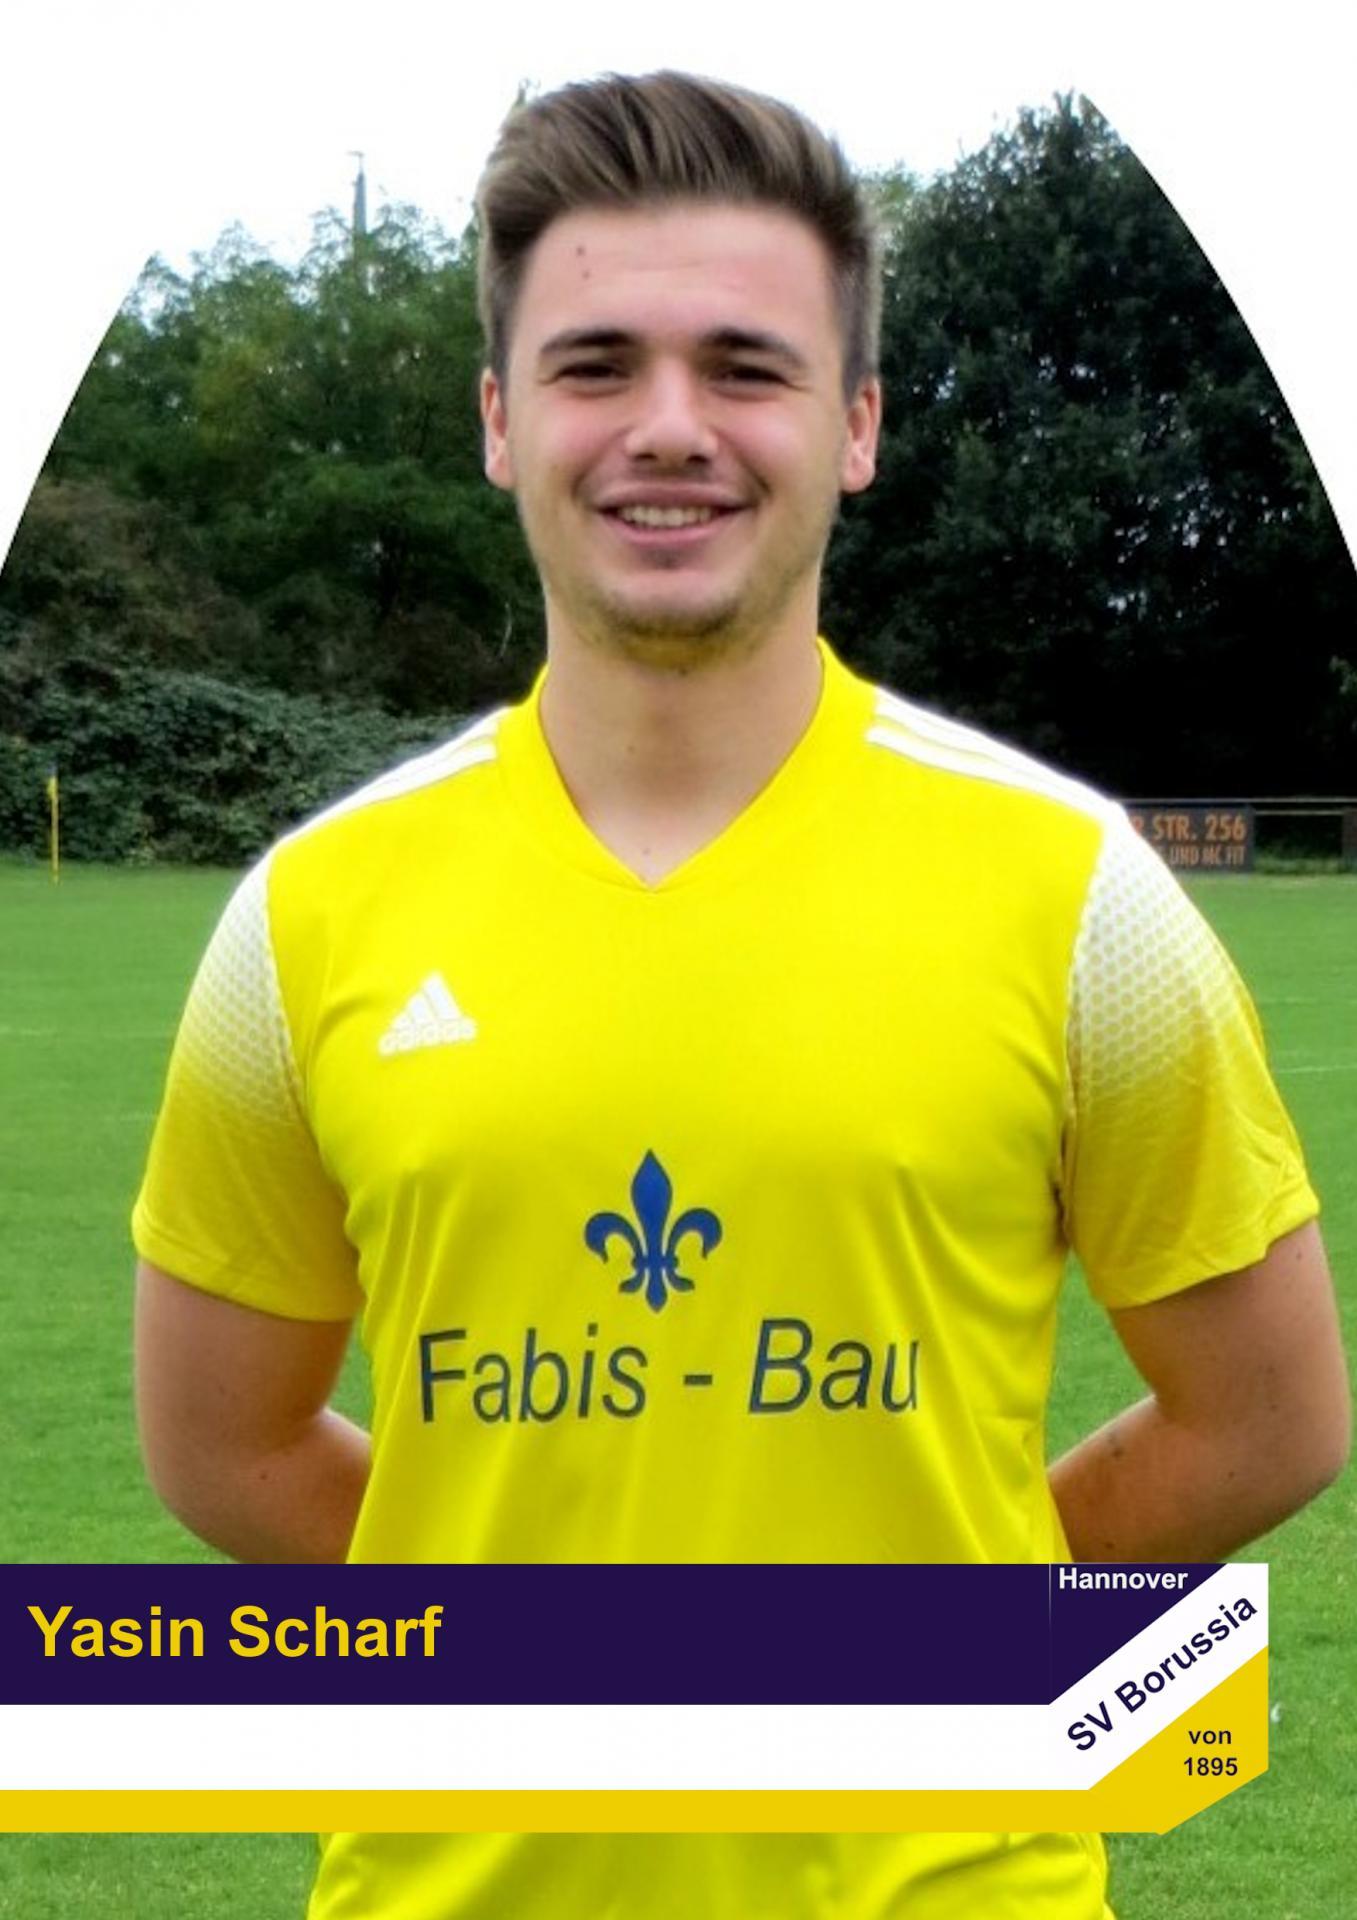 Yasin Scharf